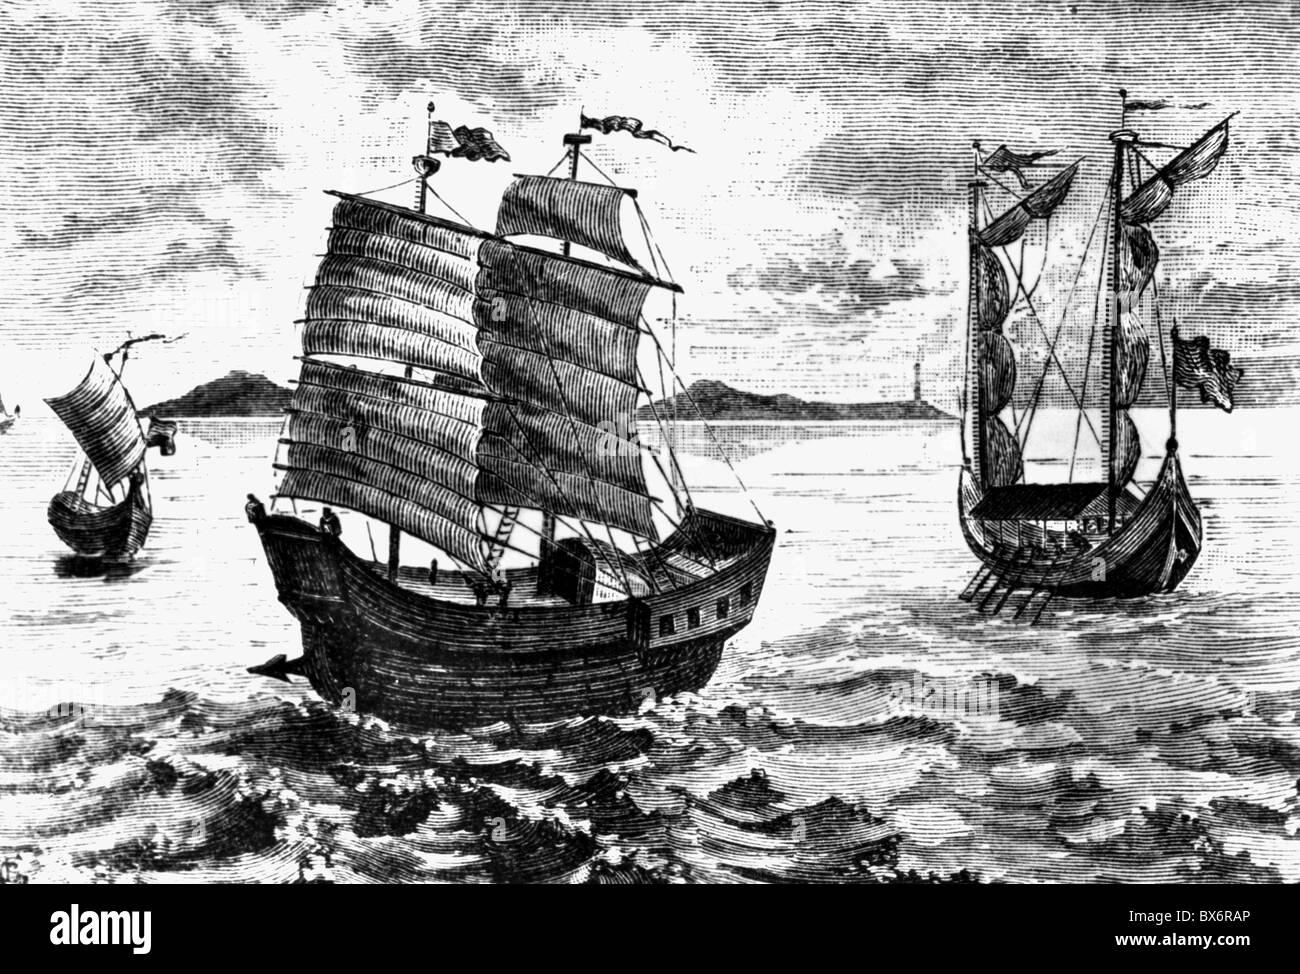 Ferdinand Magellan Portuguese Explorer: Magellan, Ferdinand (Magalhaes, Fernao De), 1480